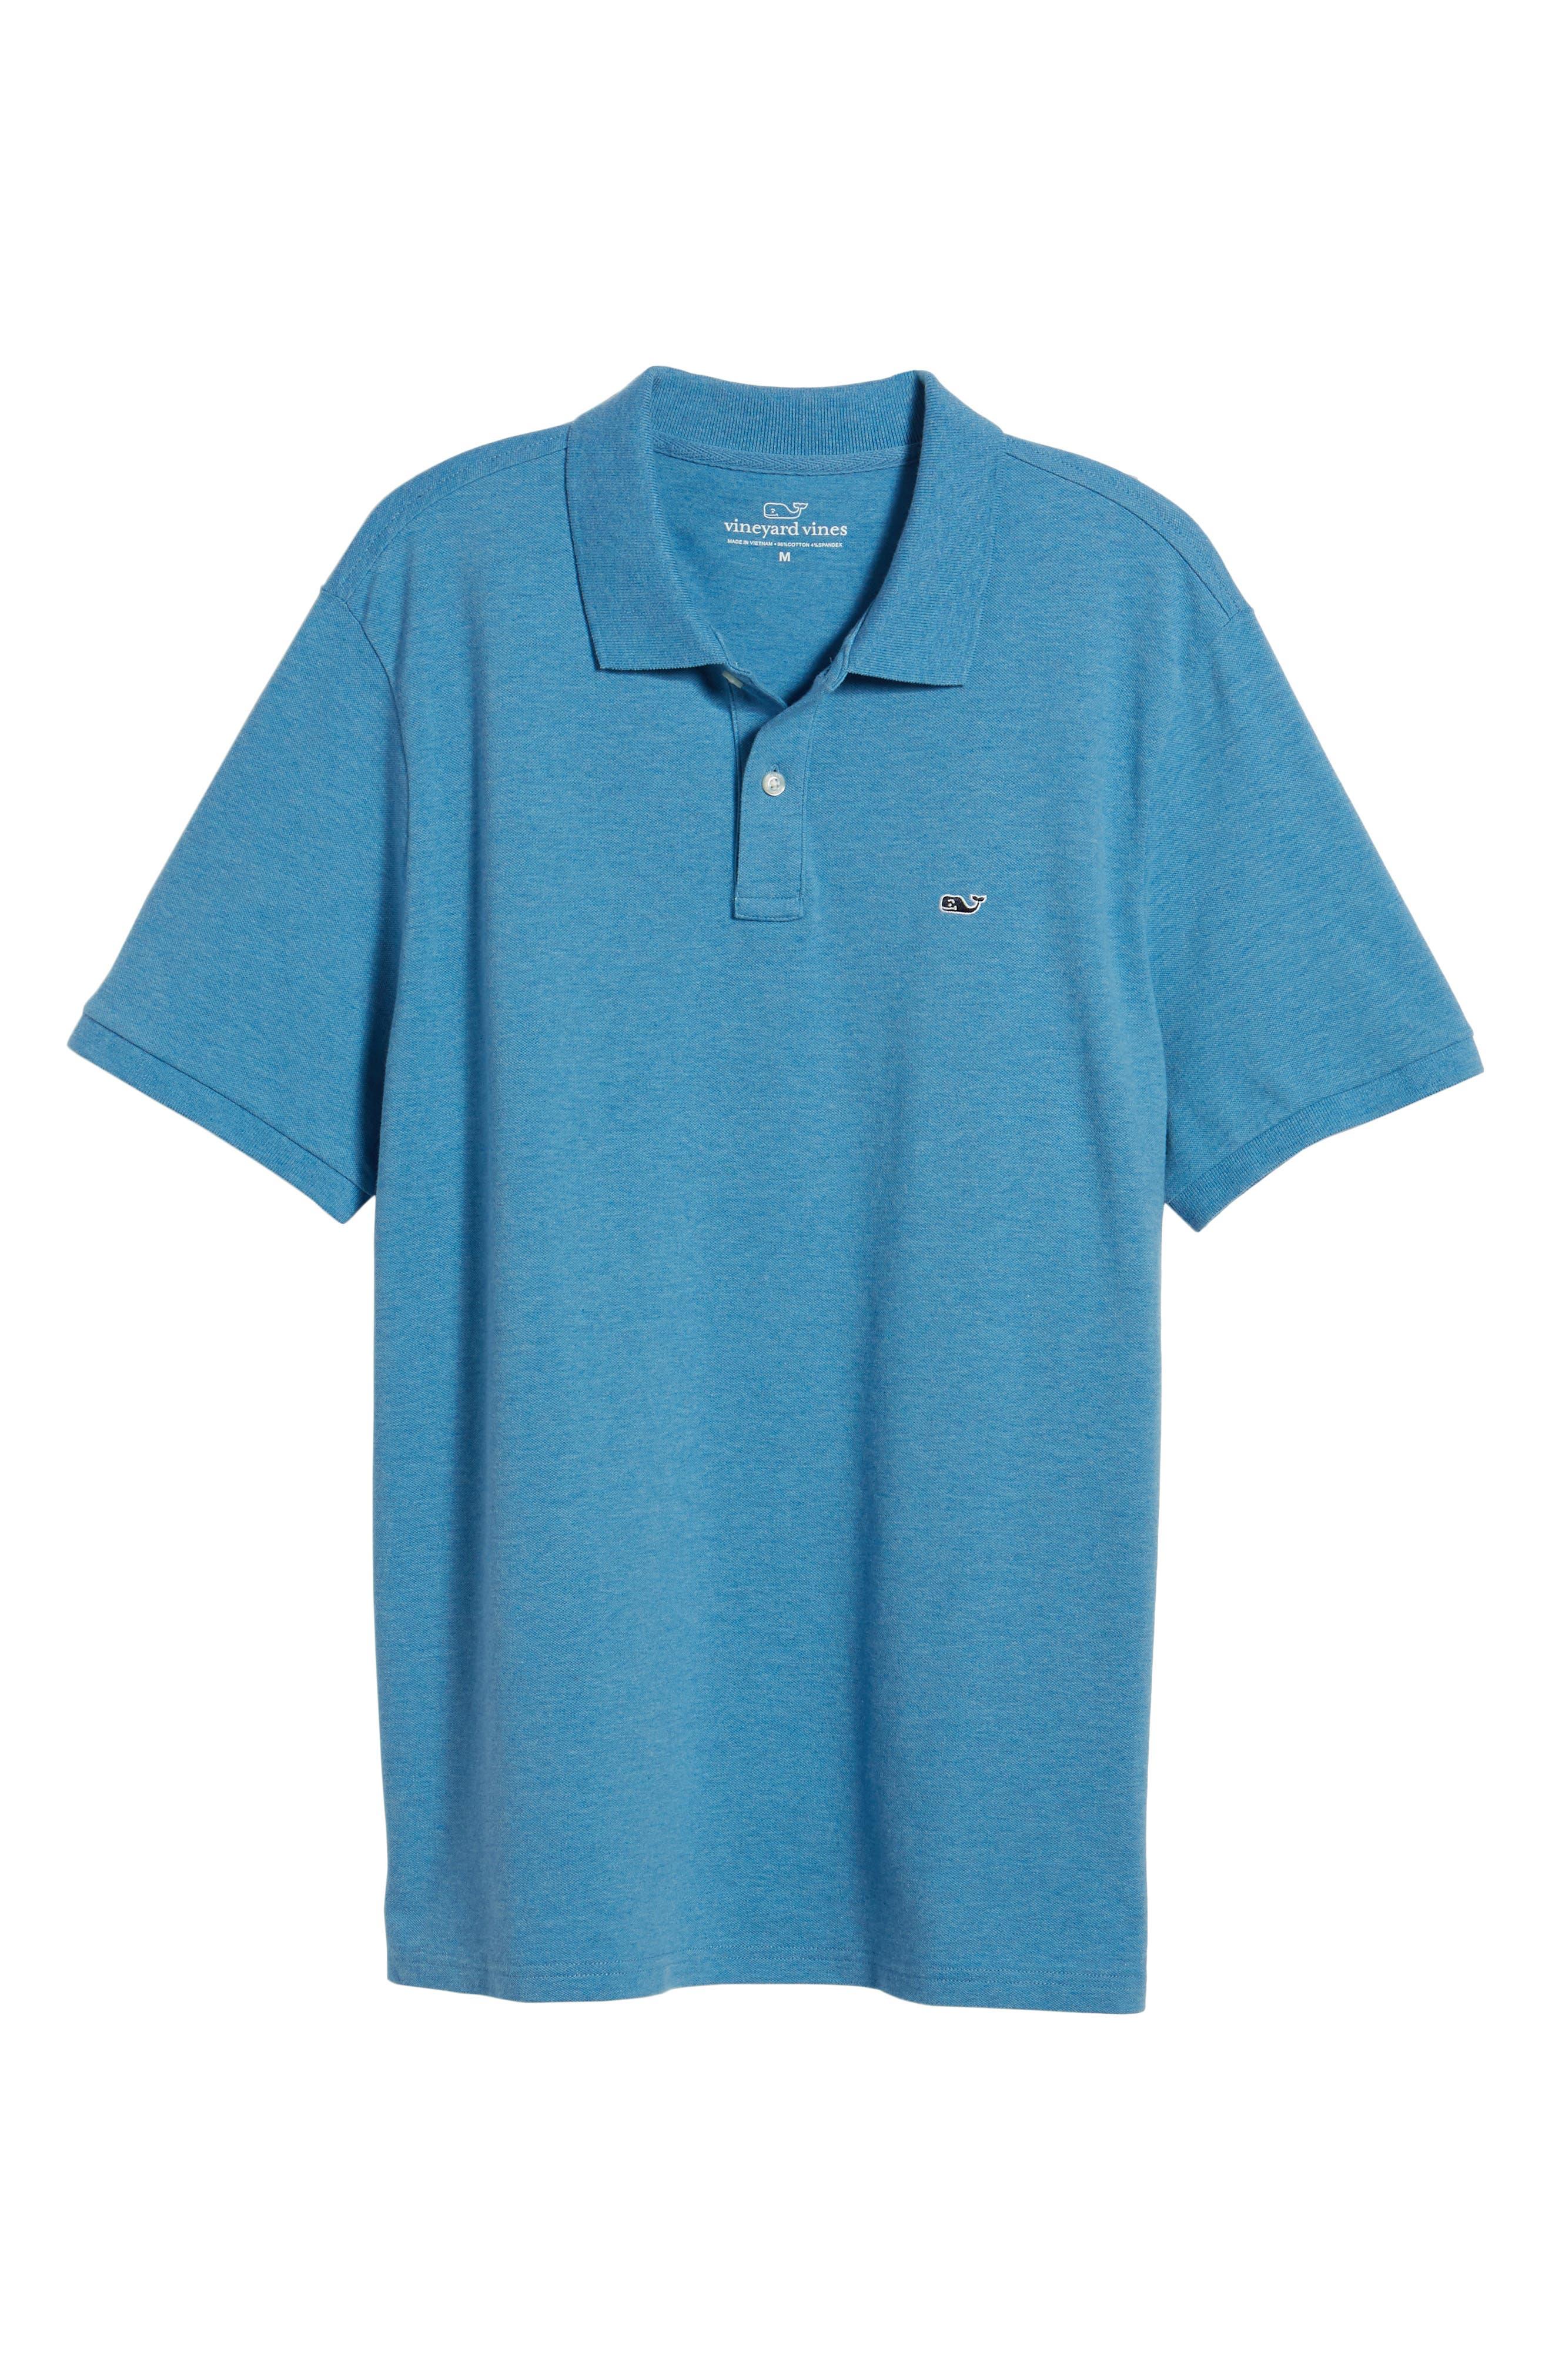 Regular Fit Piqué Polo,                             Alternate thumbnail 6, color,                             DOCKSIDE BLUE